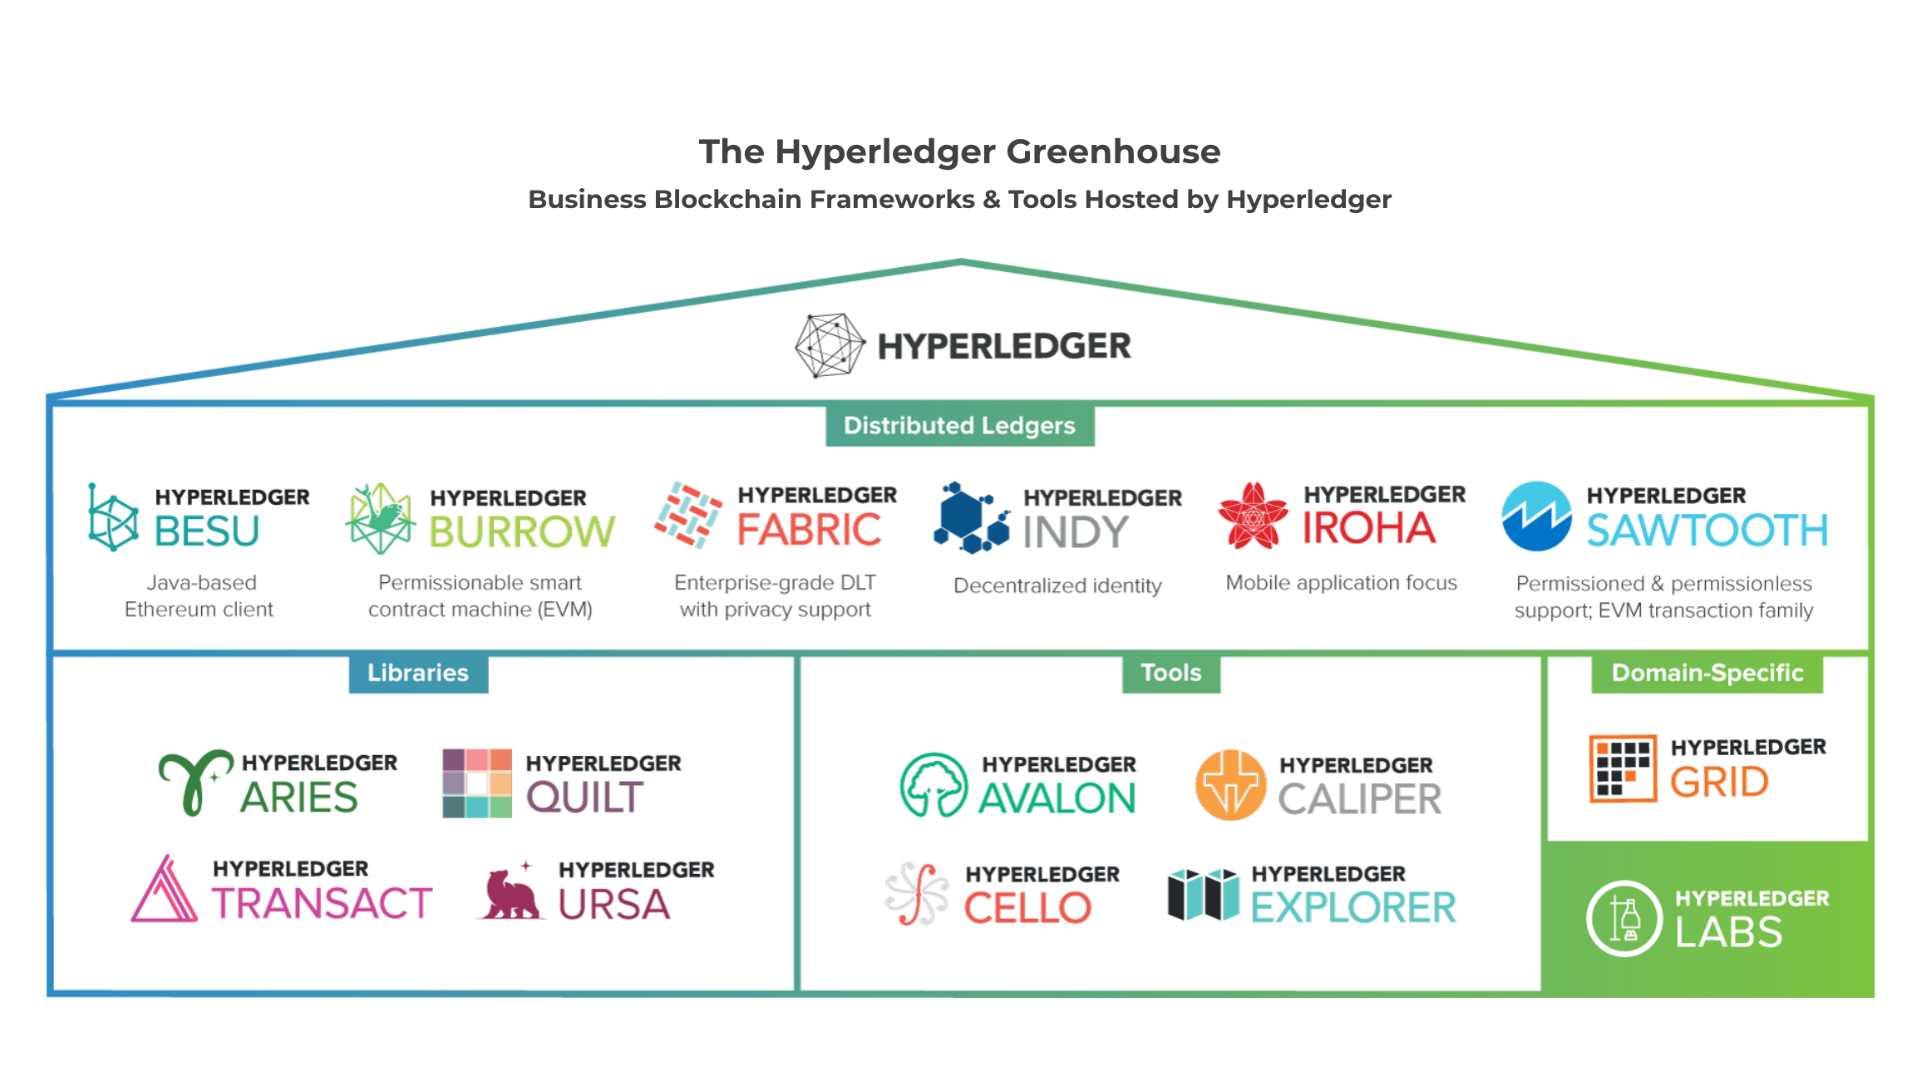 hyperledger elosztott fokonyvi technologia - 2